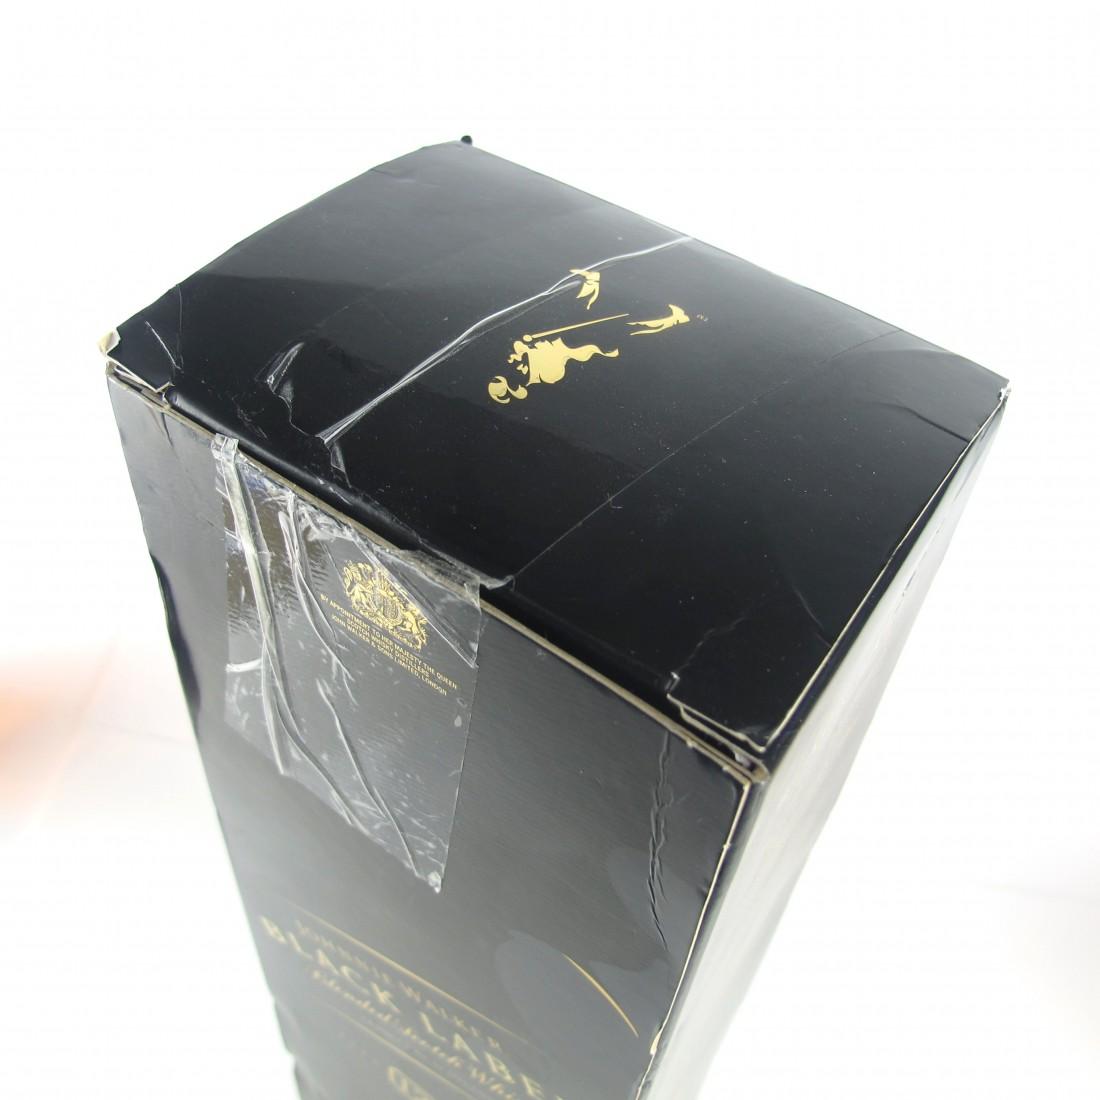 Johnnie Walker Red Label & Black Label 2 x 1 Litre / Includes Miniatures 2 x 5cl